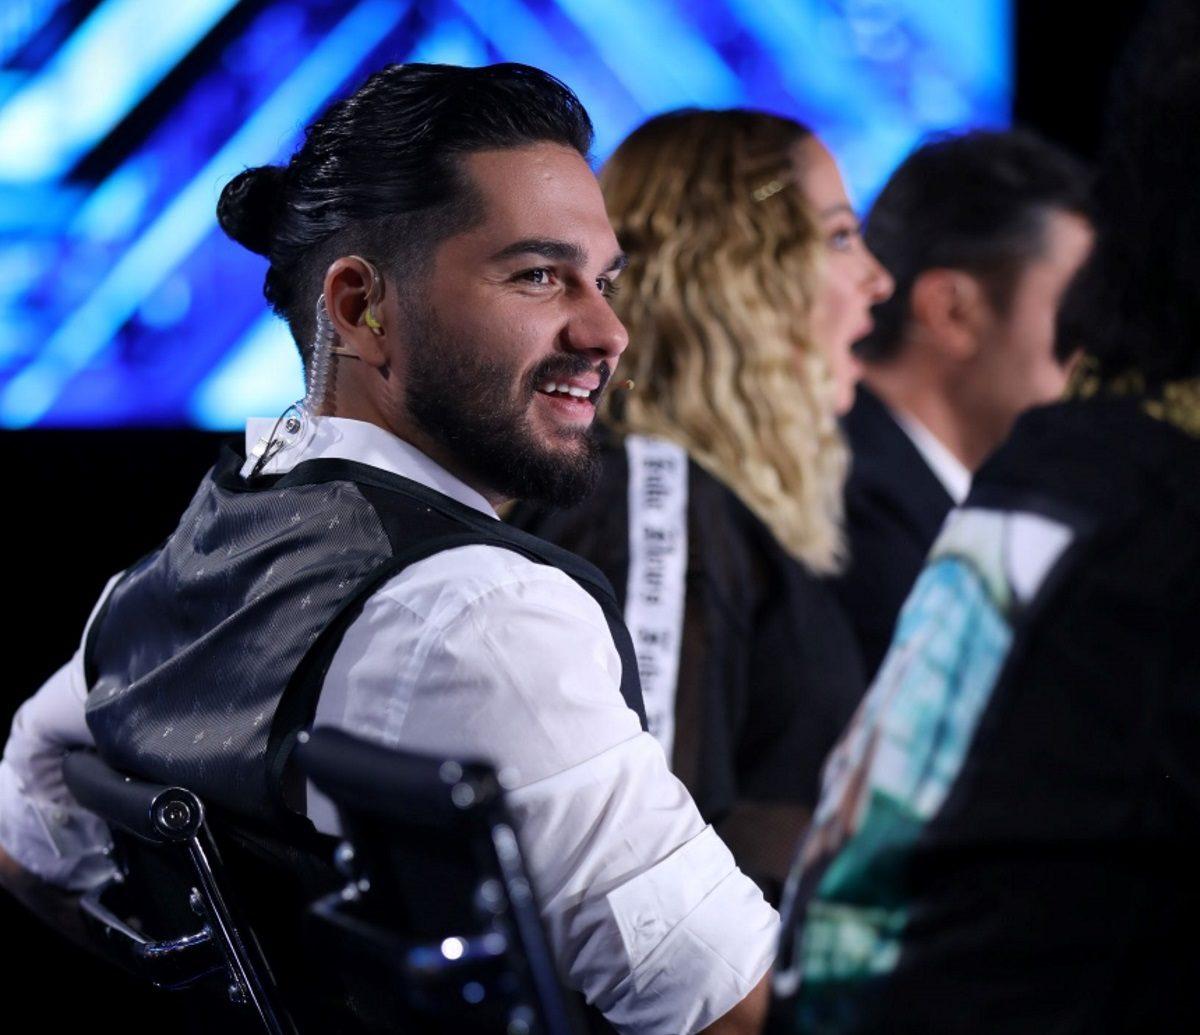 X-Factor: Σήμερα το τελευταίο Chair Challenge – Δύσκολα τα πράγματα για τον Χρήστο Μάστορα | tlife.gr